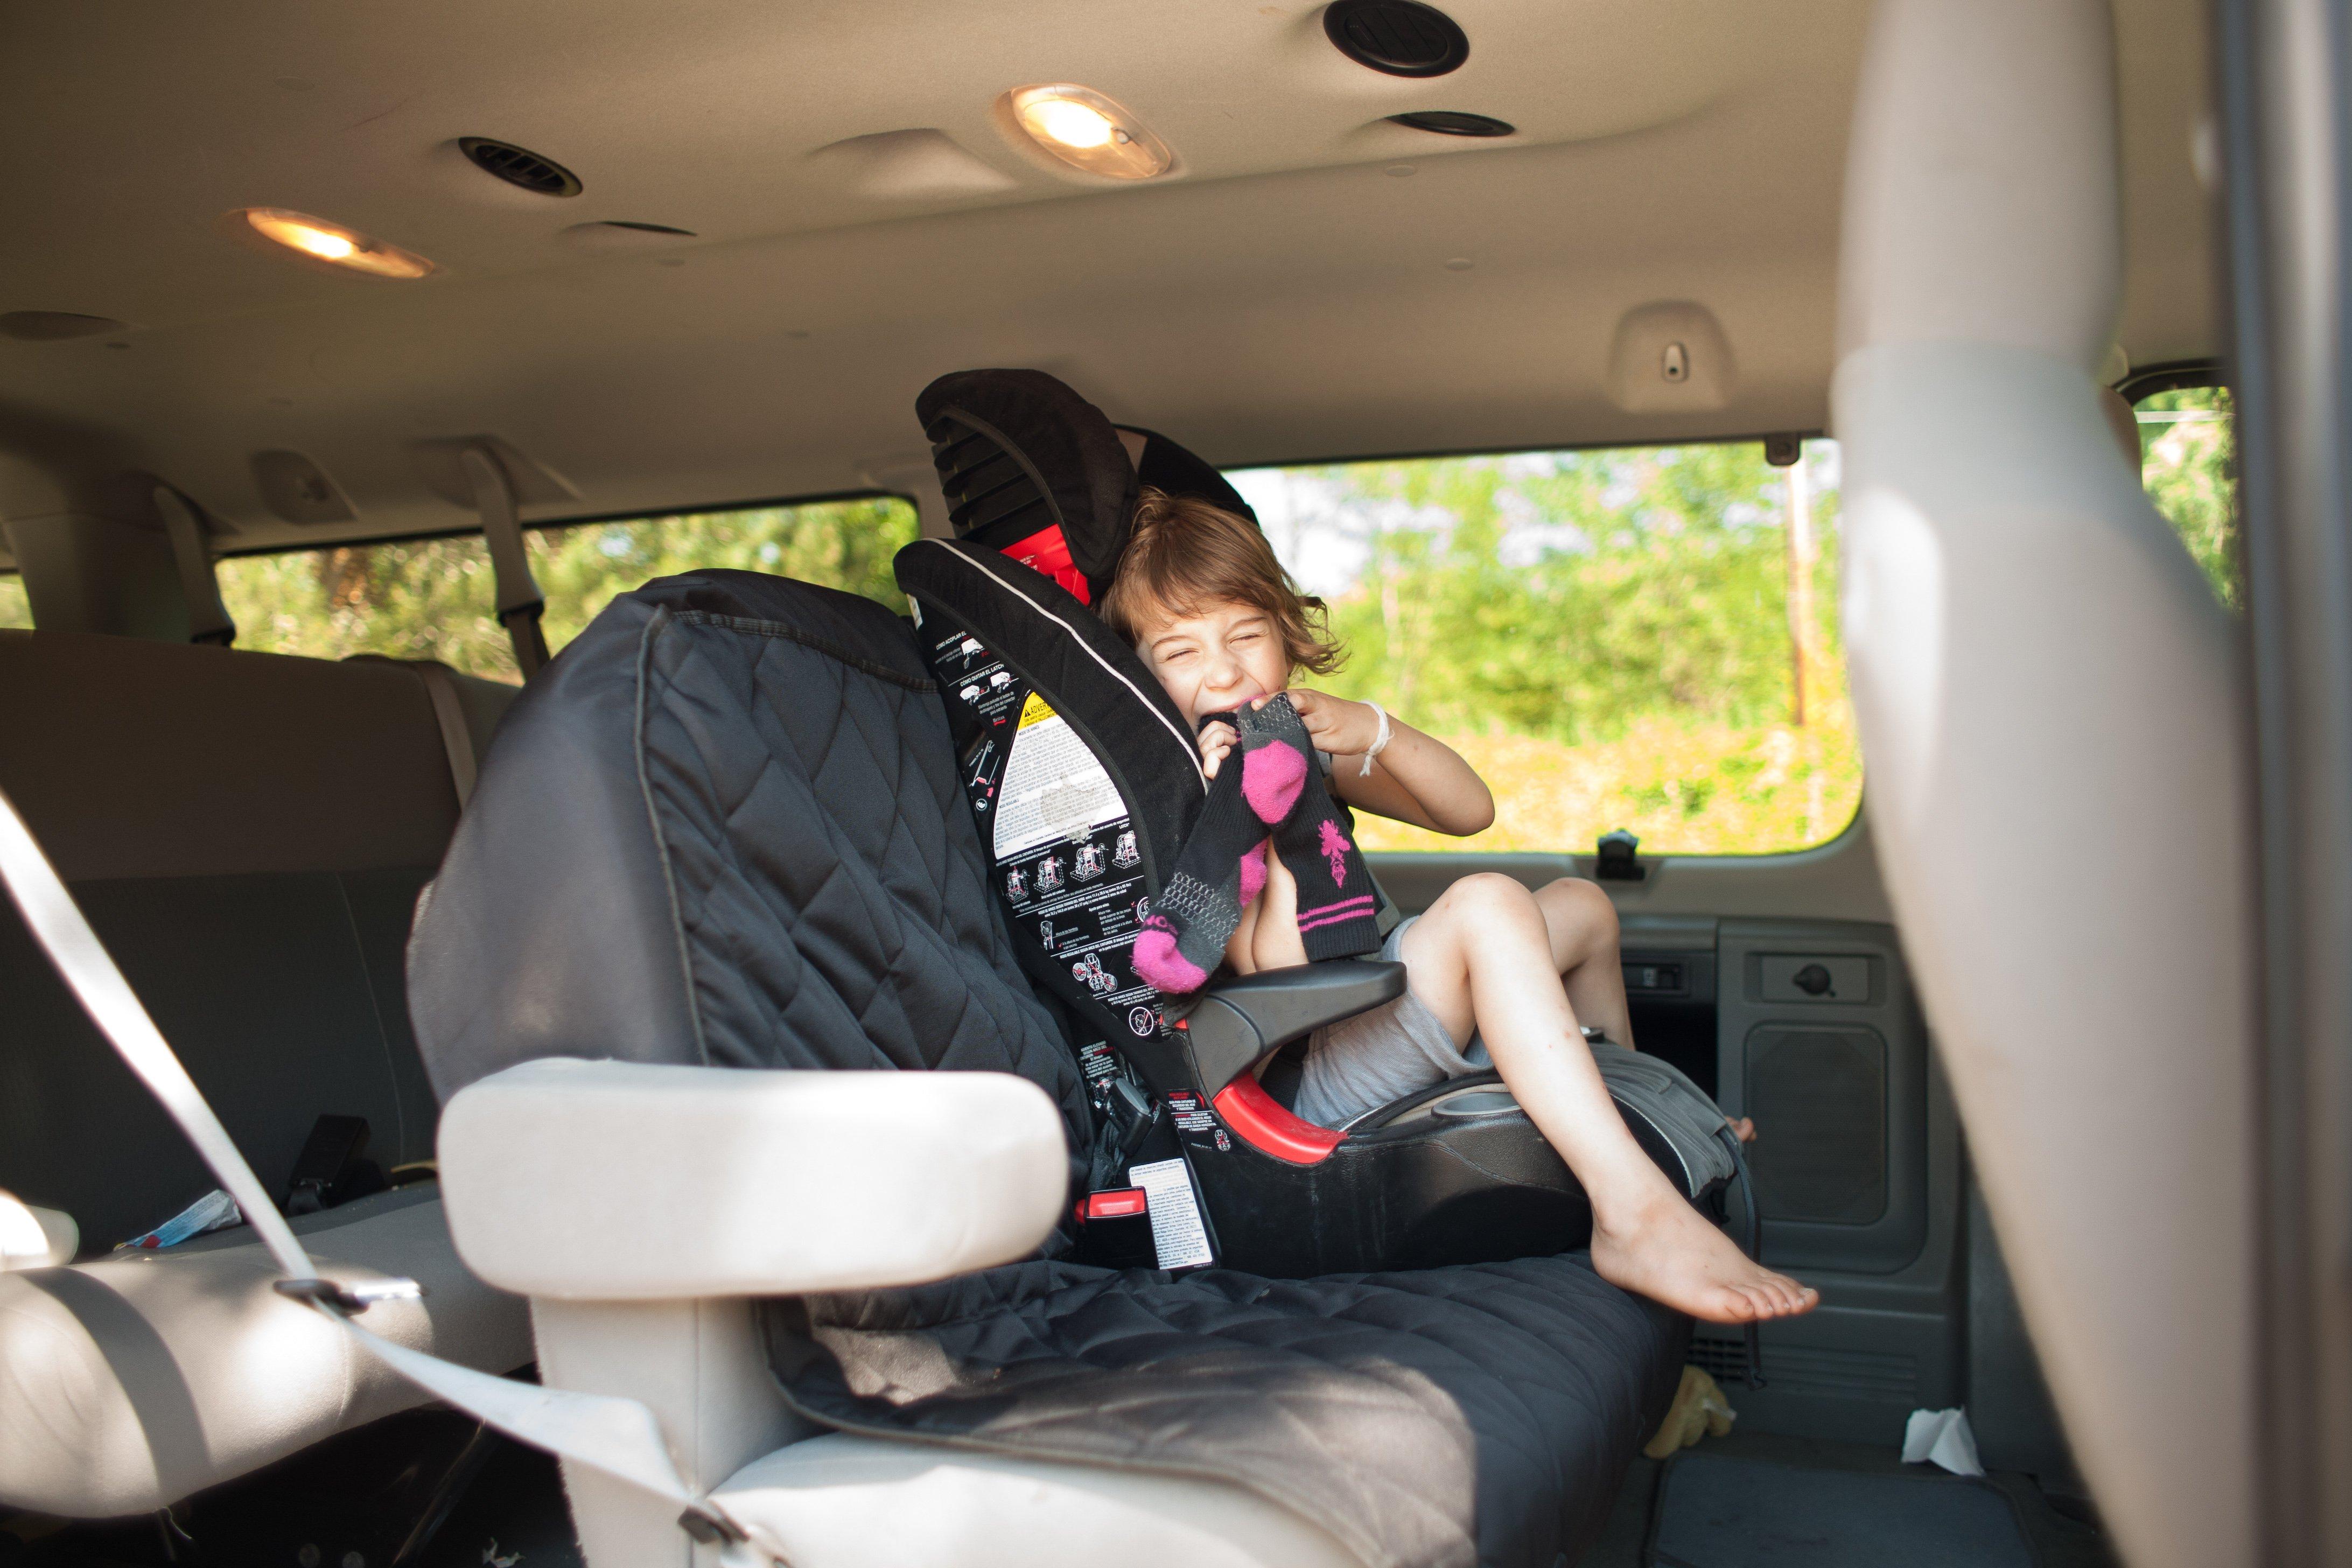 VersaVia car seat cover